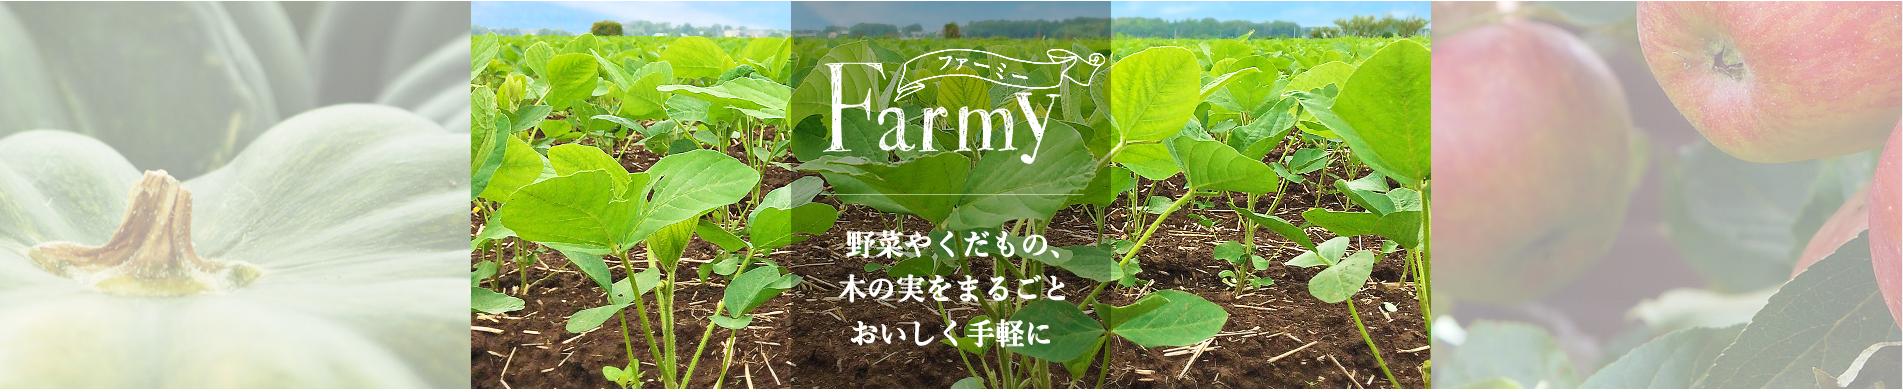 Farmy特集